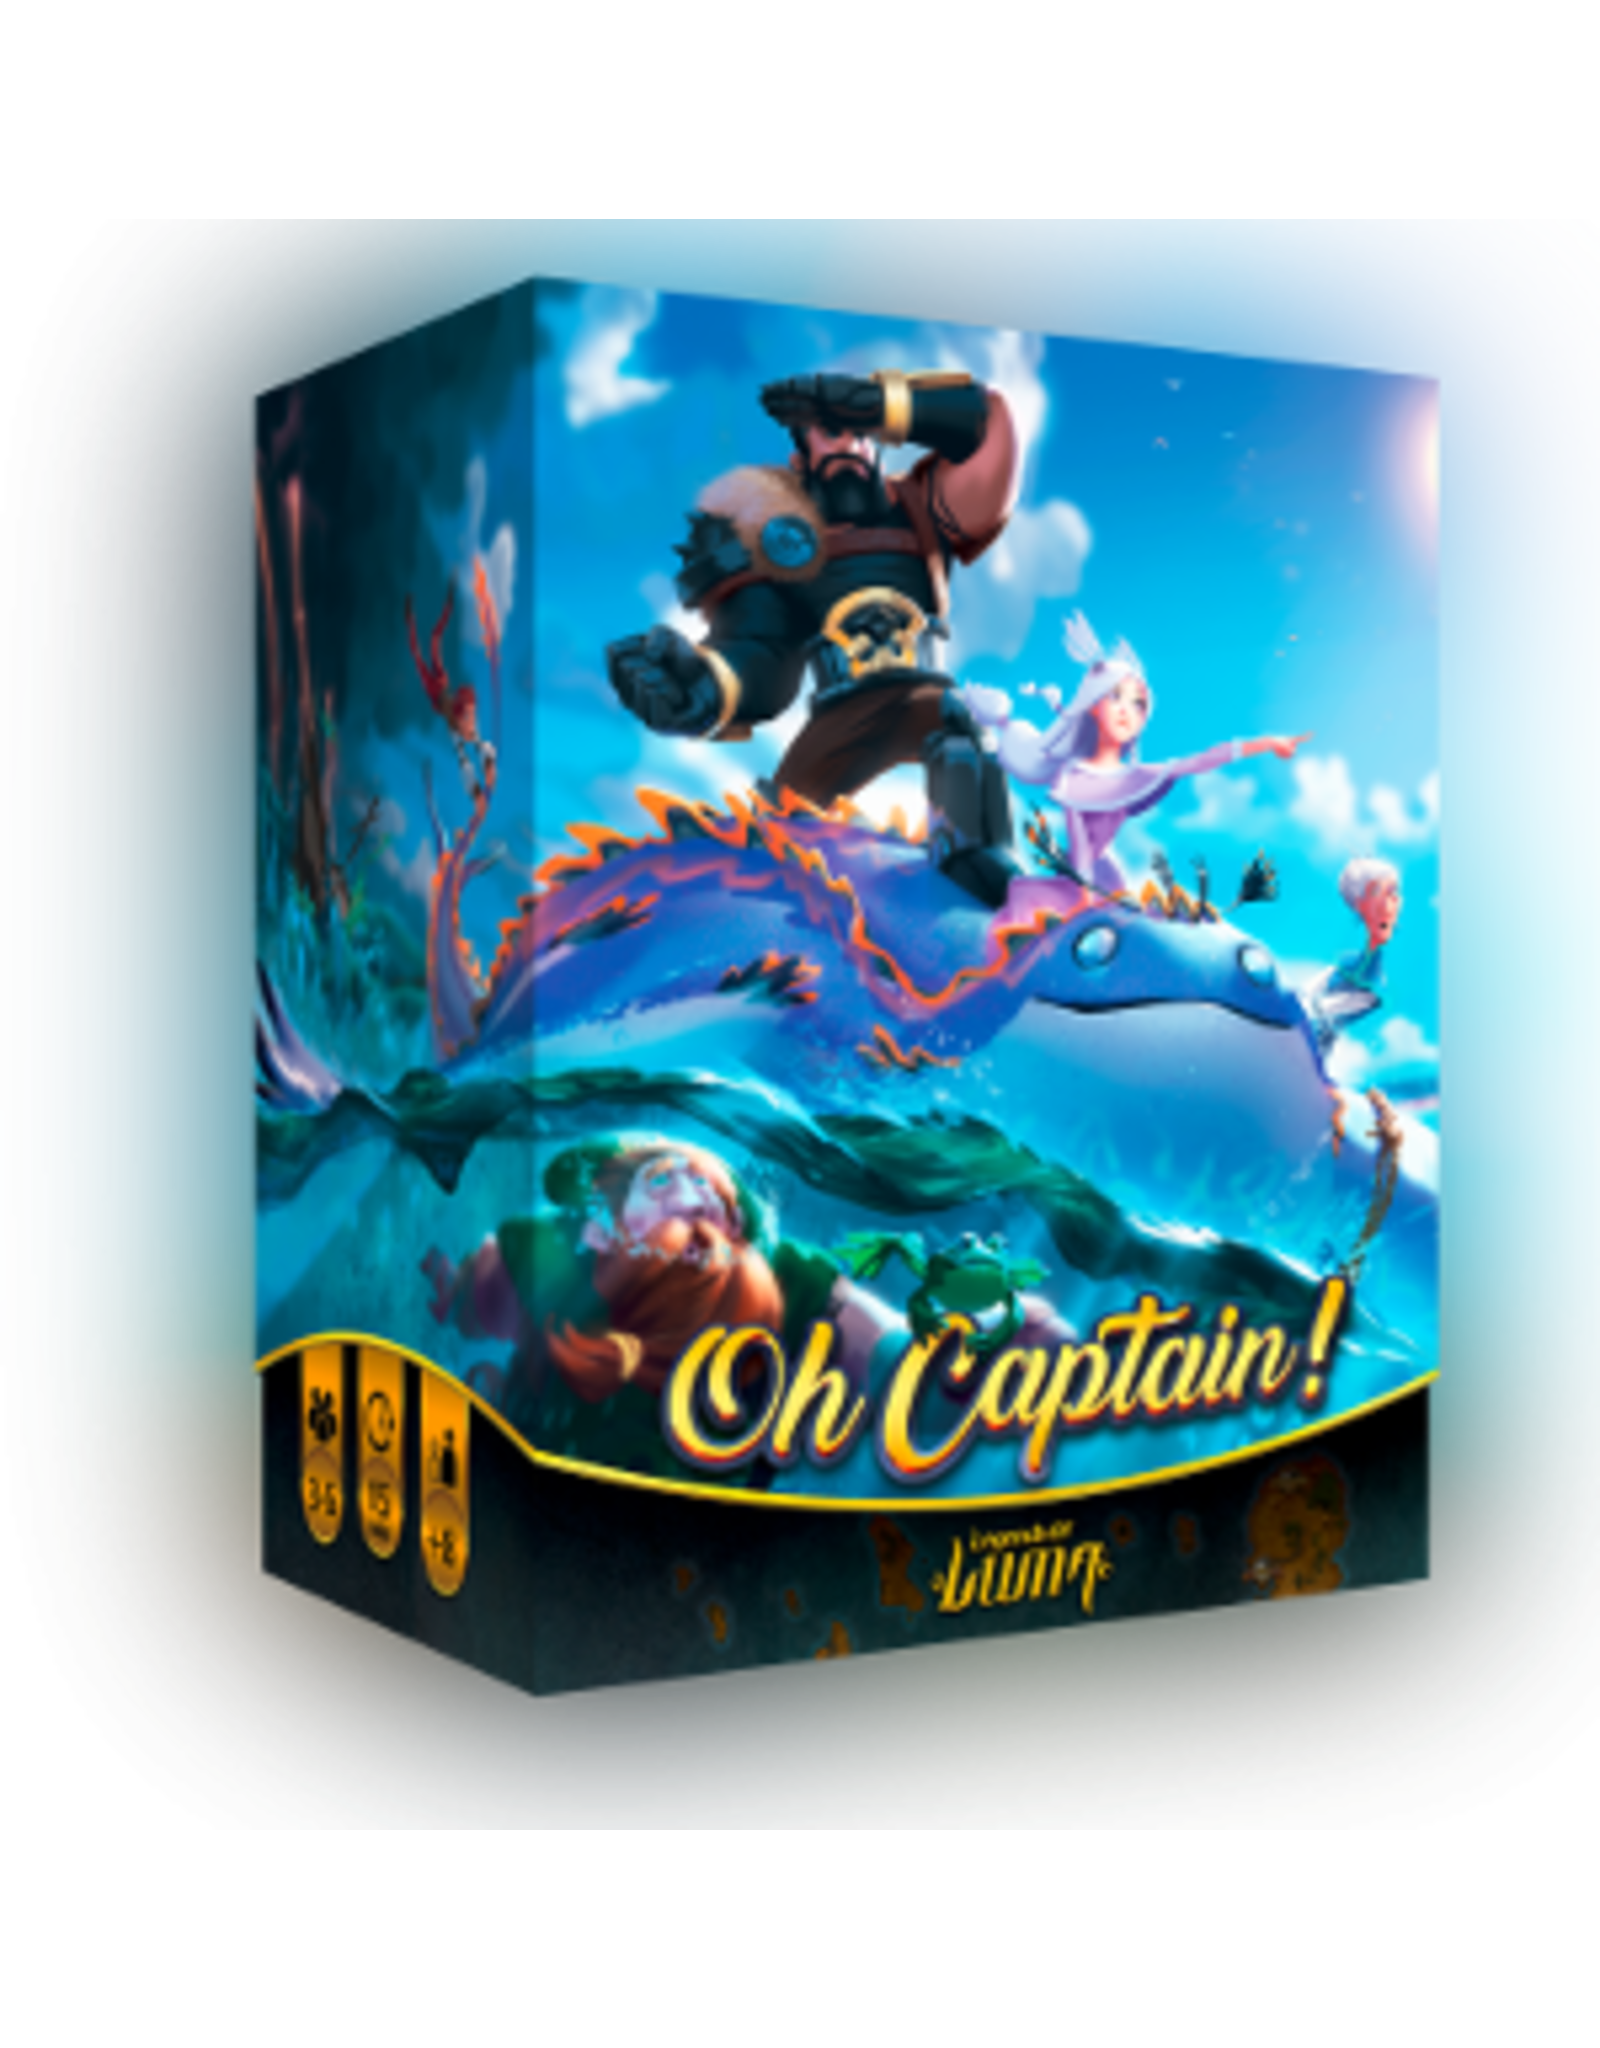 Luma Oh Capitaine!